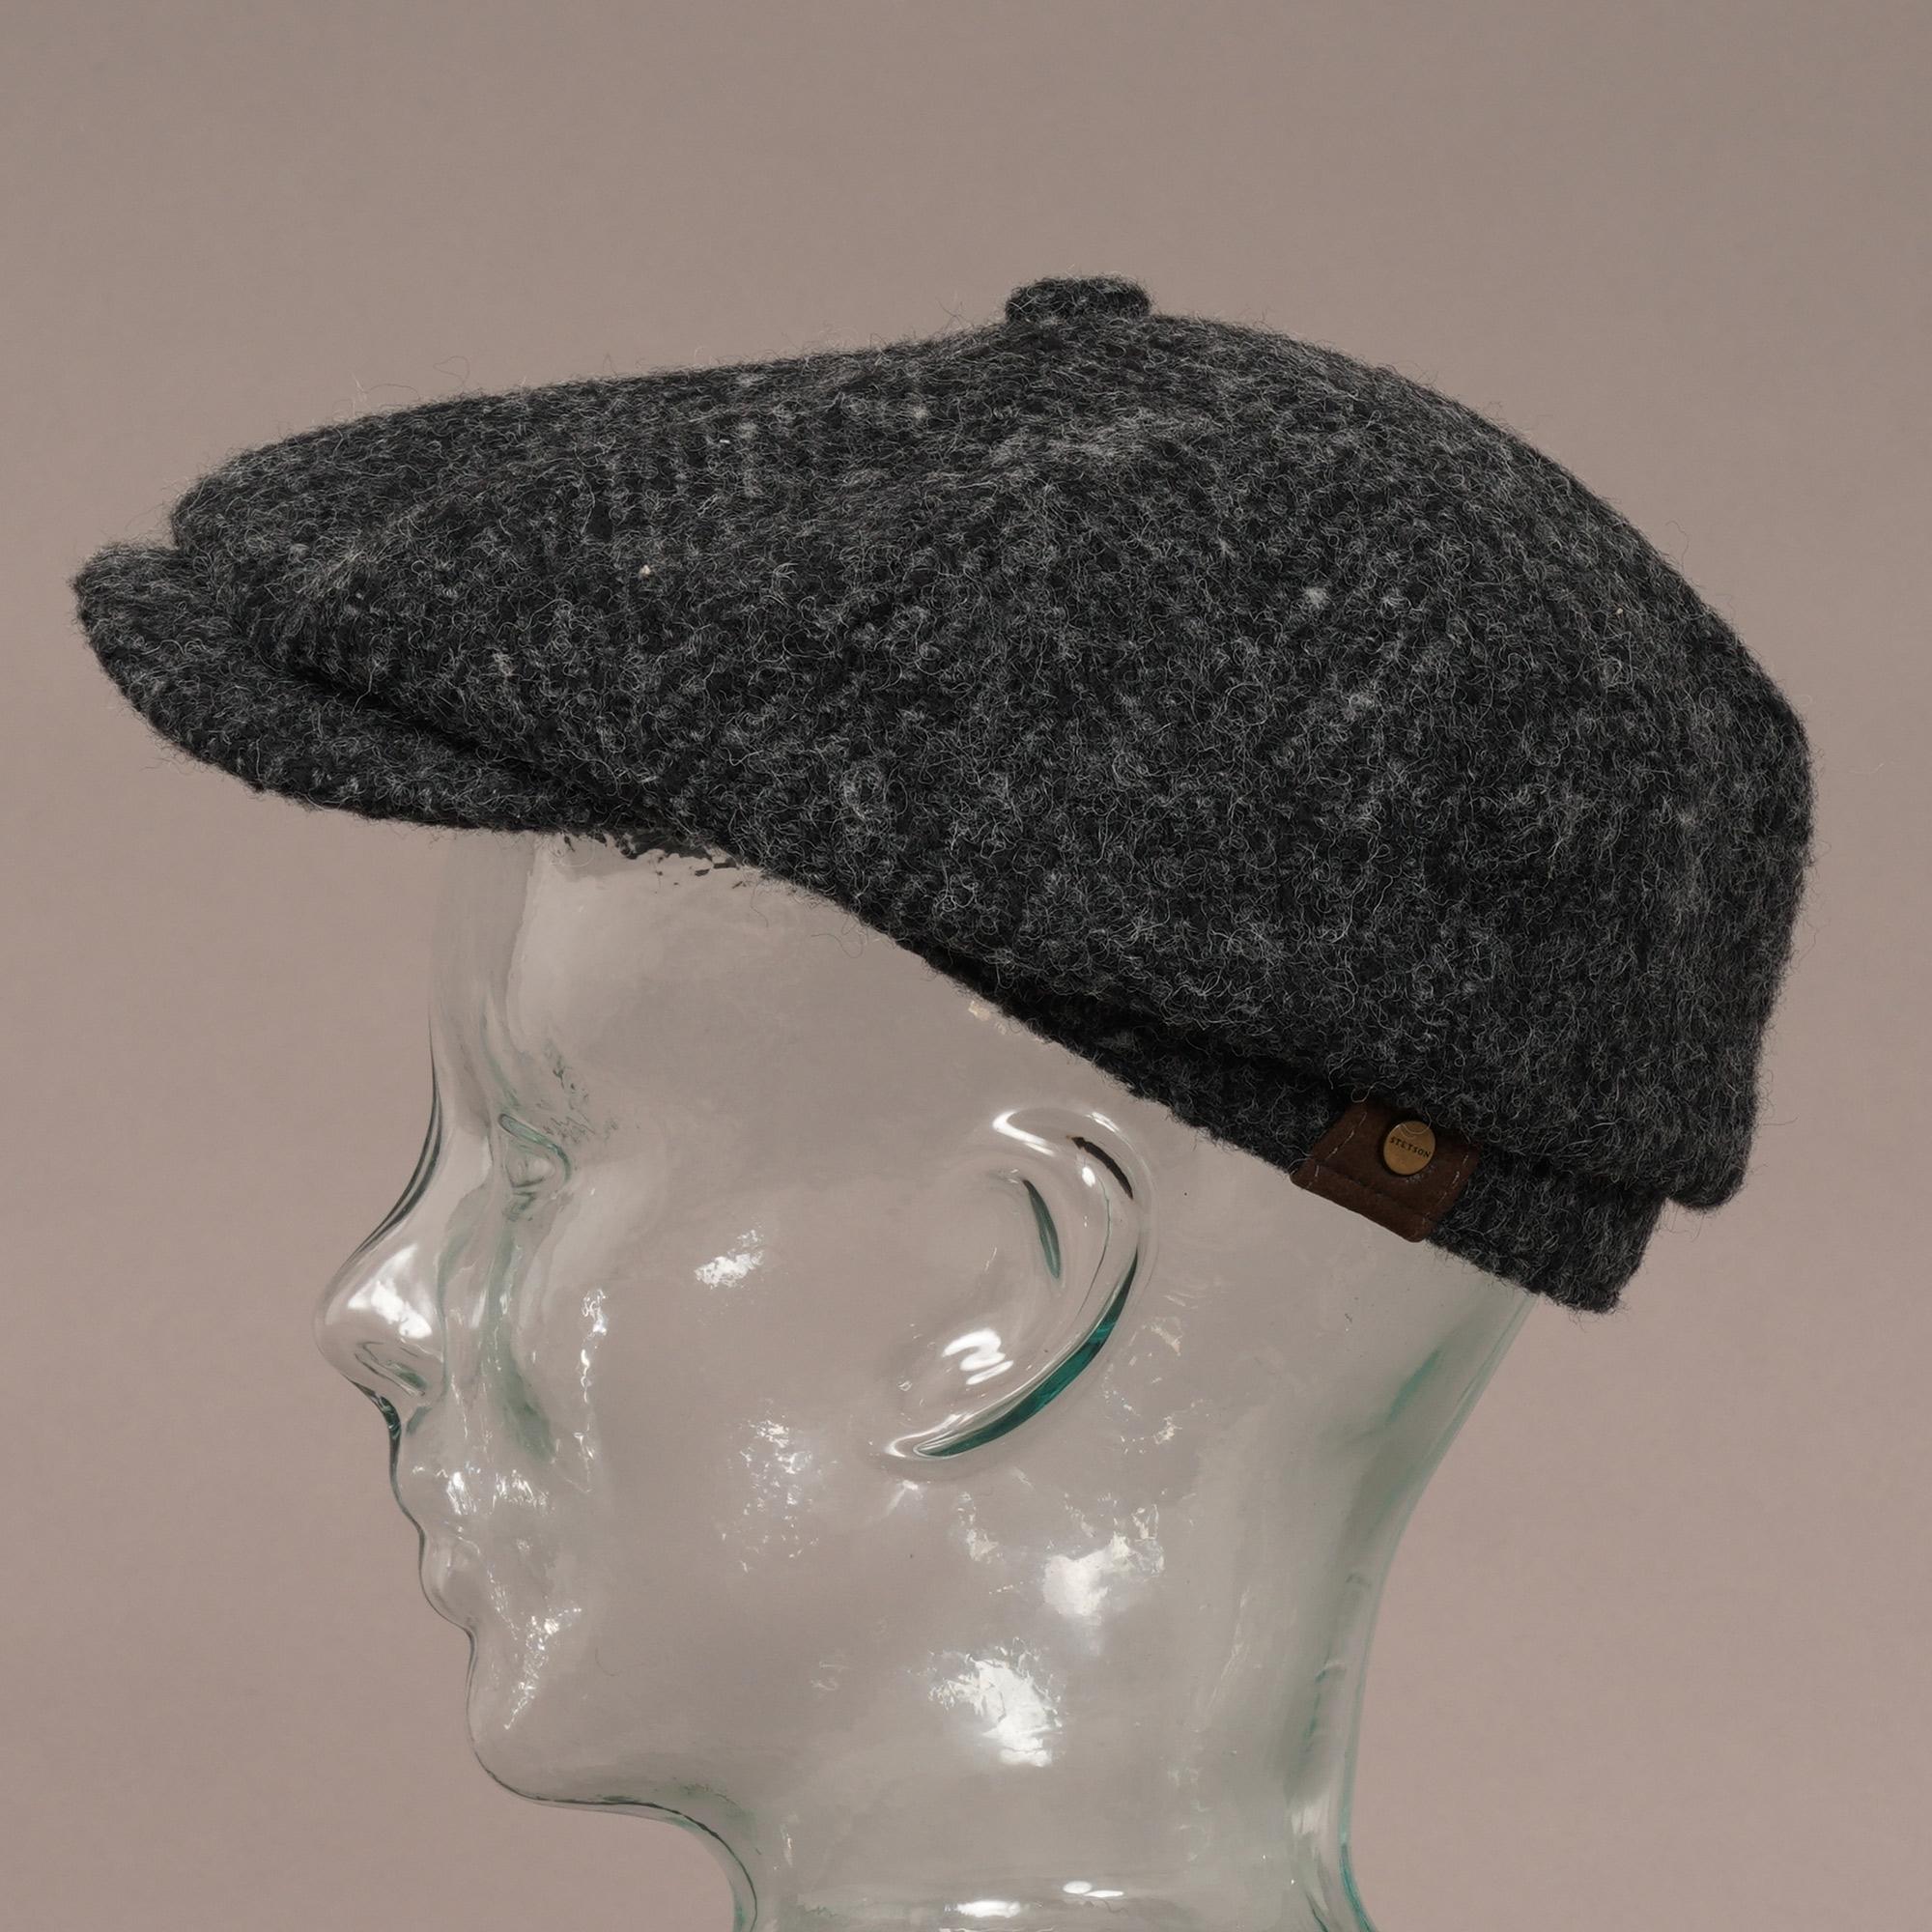 b2e0c8b0 Stetson Wool Hatteras Flat Cap | Black | 6840502-331